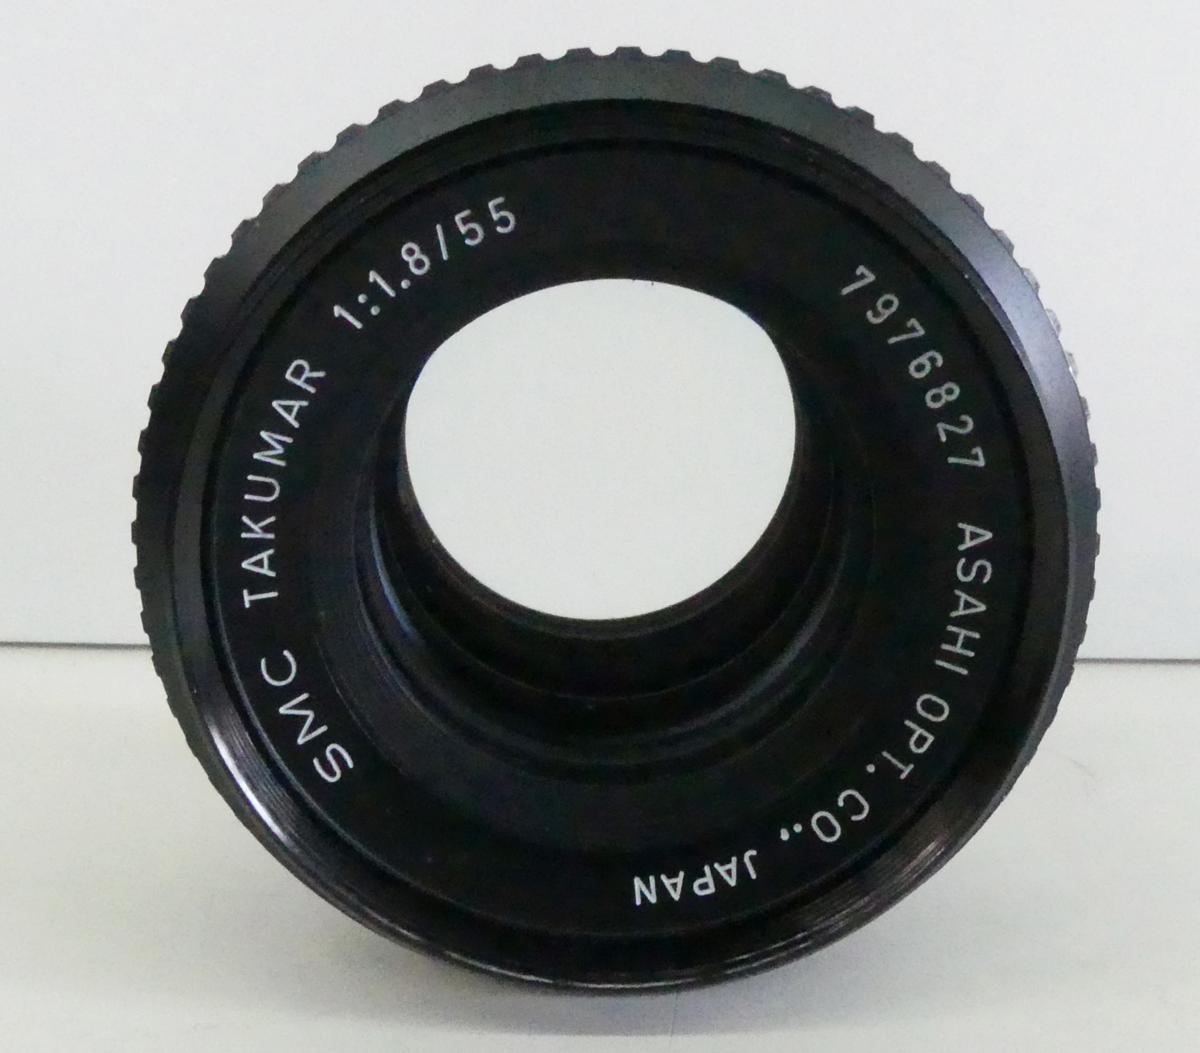 ☆PENTAX ペンタックス SMC TAKUMAR 55mm F1.8 USED☆_画像1